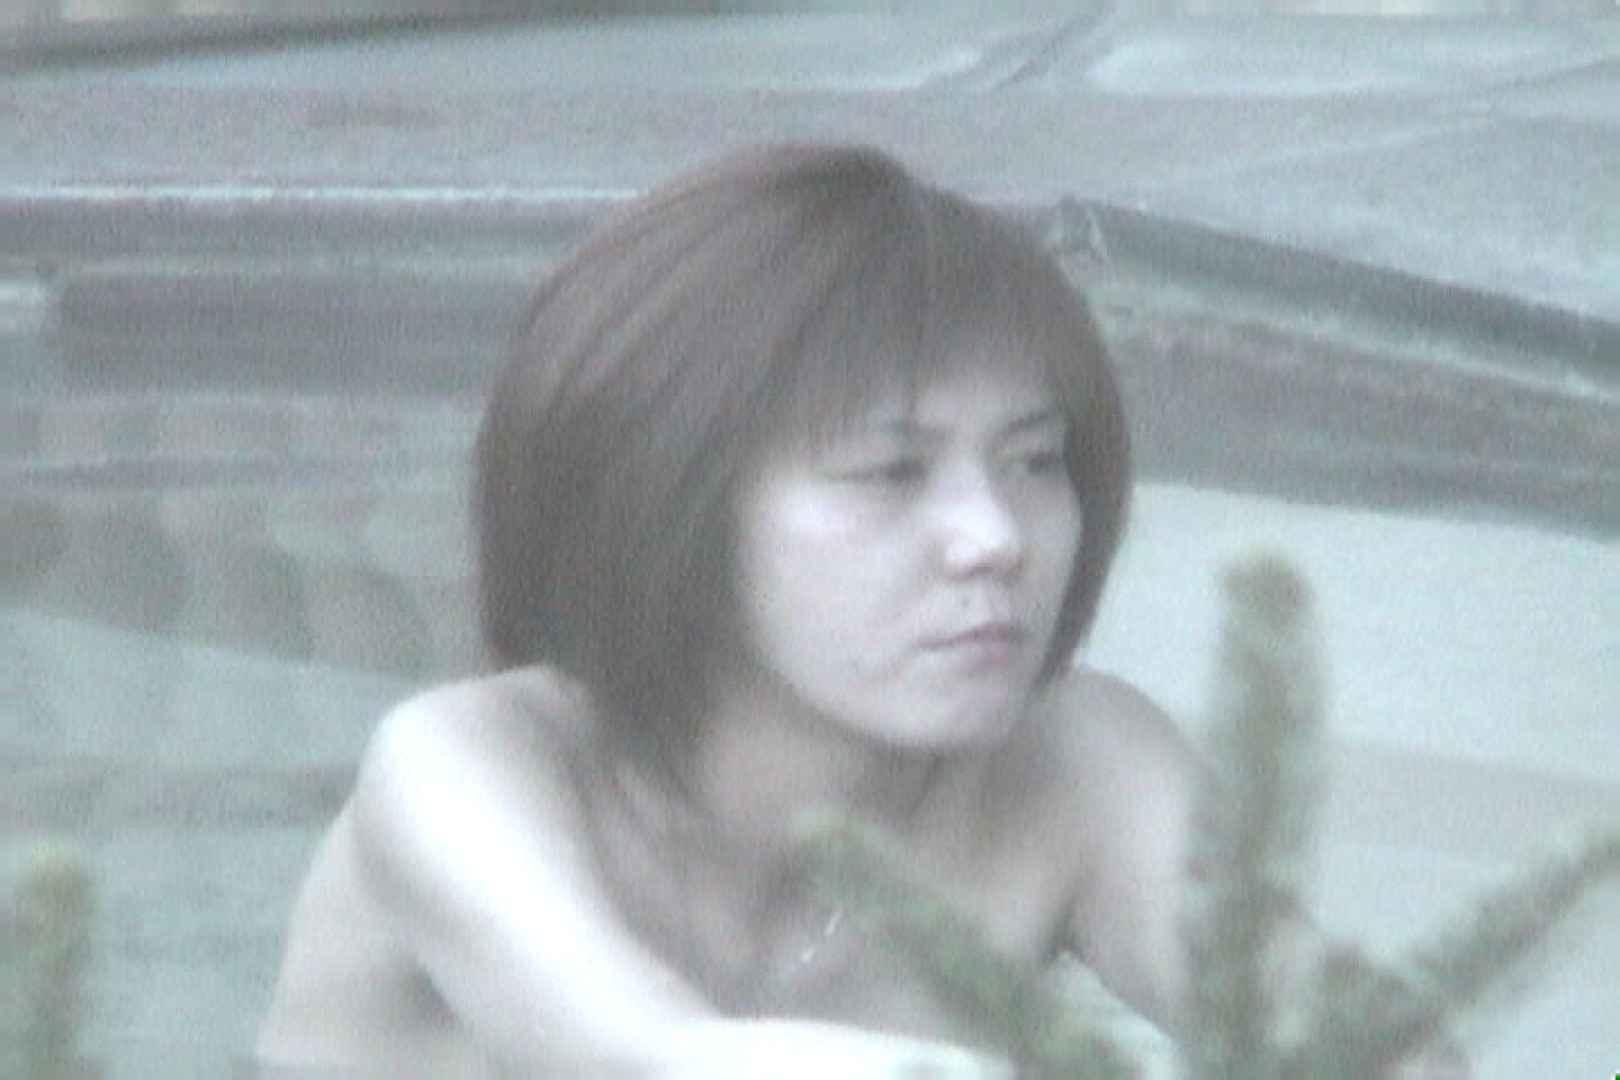 Aquaな露天風呂Vol.560 露天 | HなOL  62pic 47